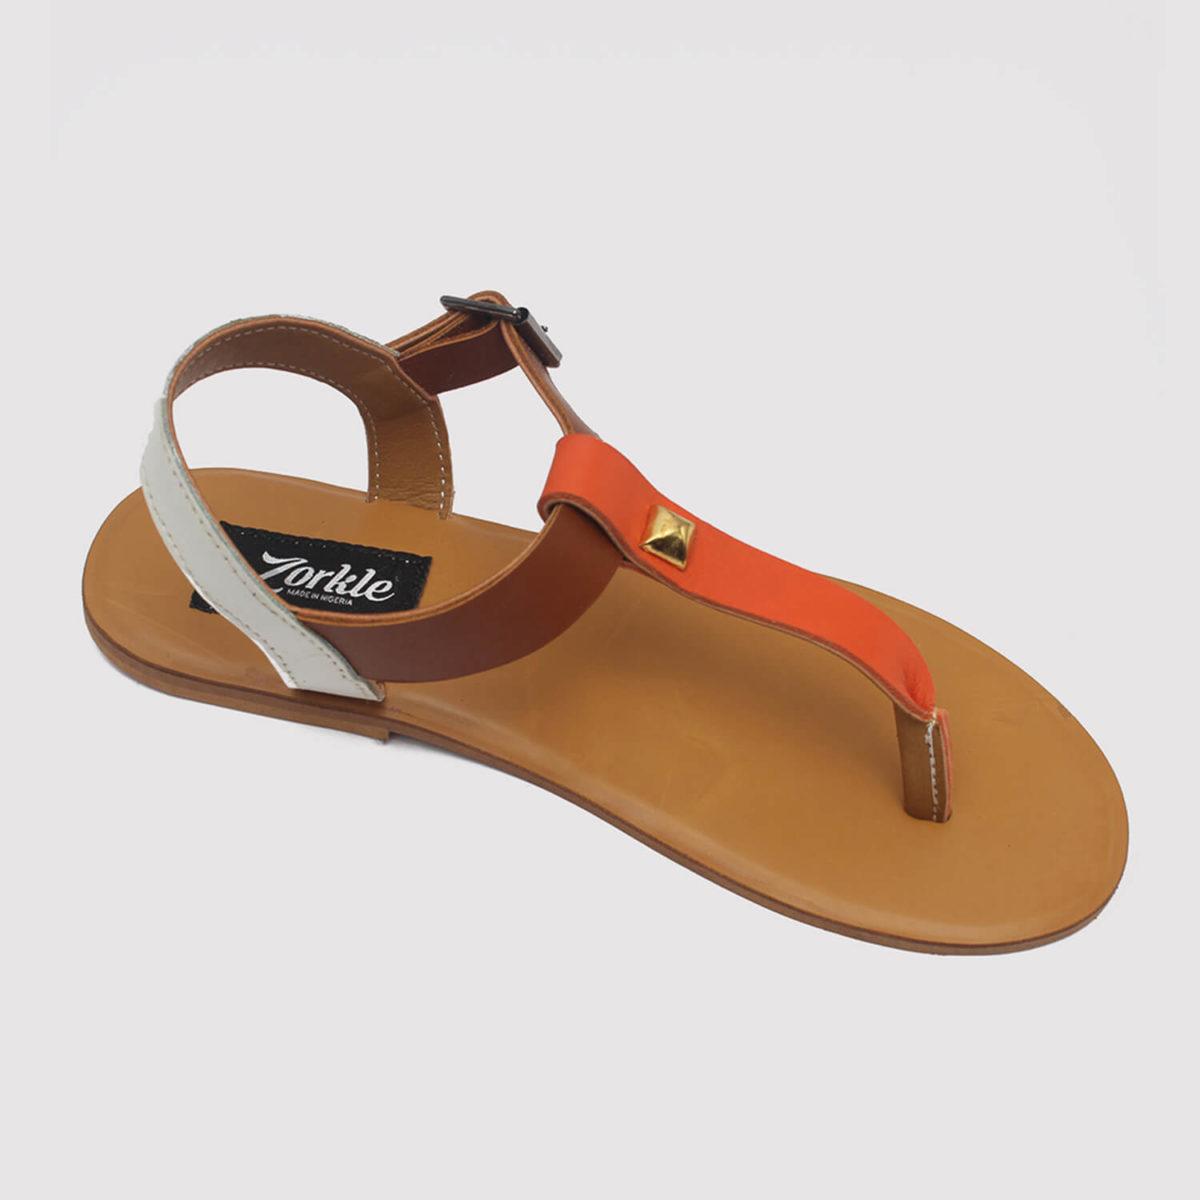 toke sandals orange brown white by zorkle shoes lagos nigeria